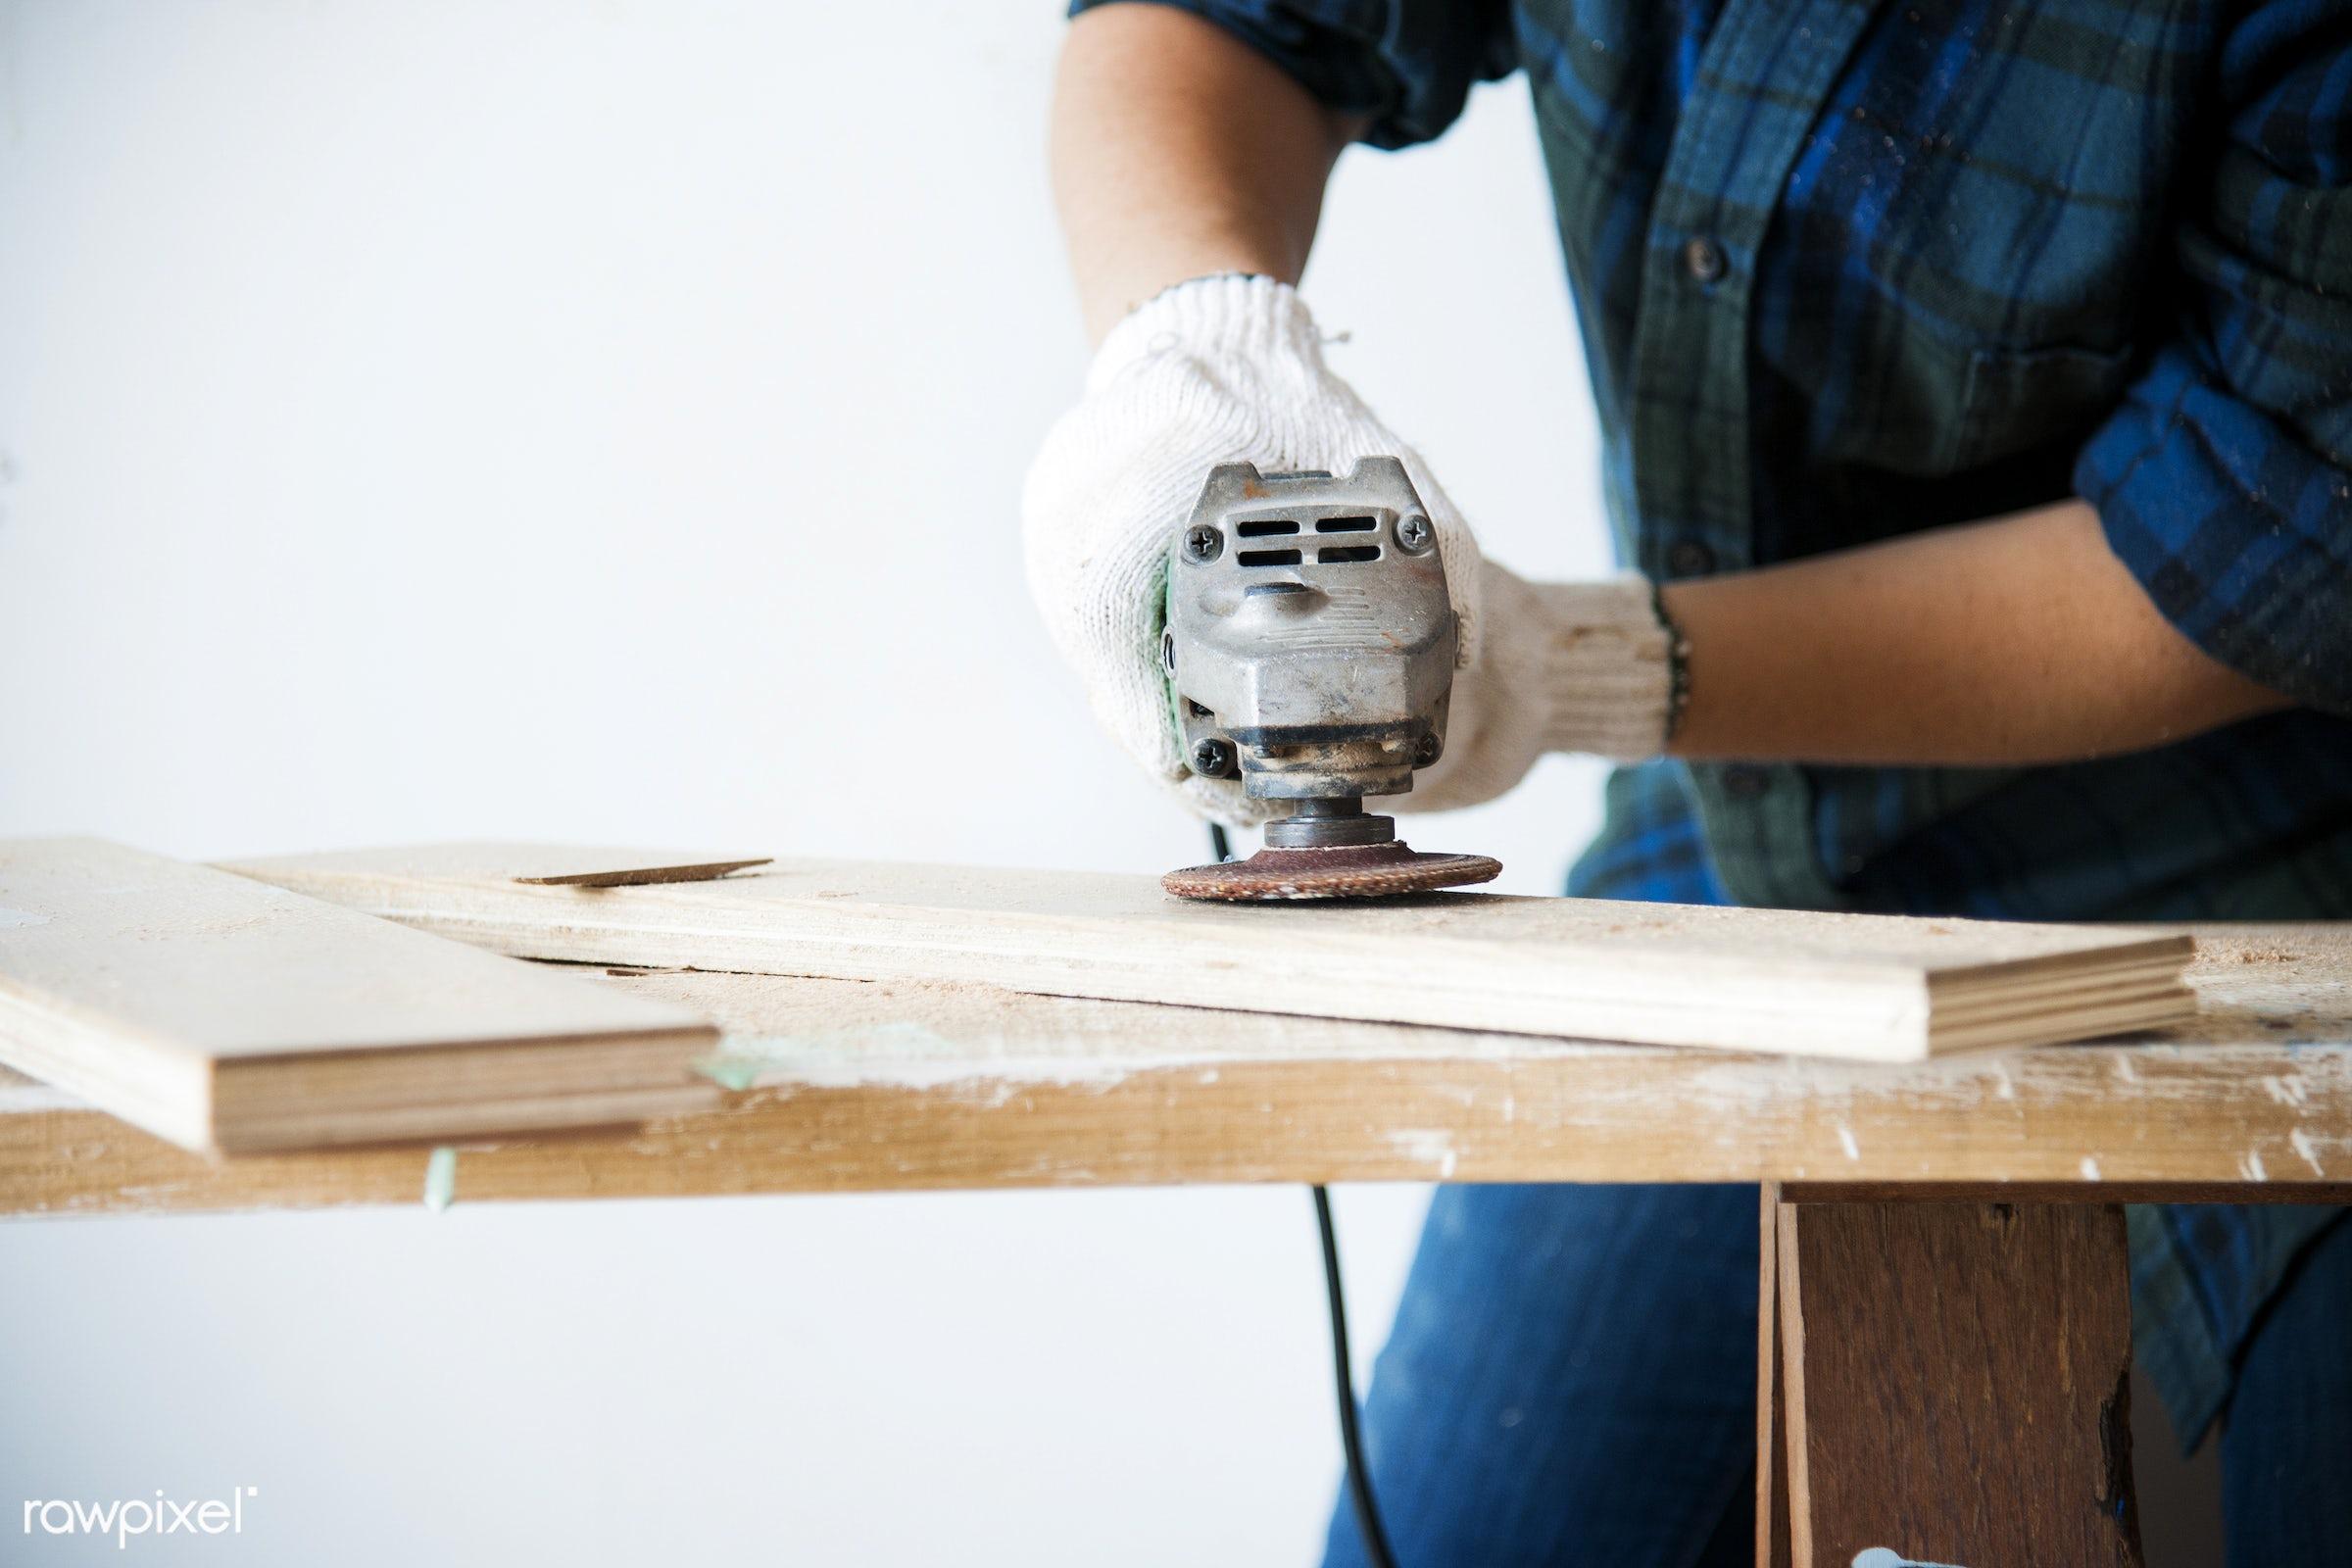 carpentry, construction, wood, activity, carpenter, craft, craftsman, design, diy, equipment, handmade, handyman, hobbies,...